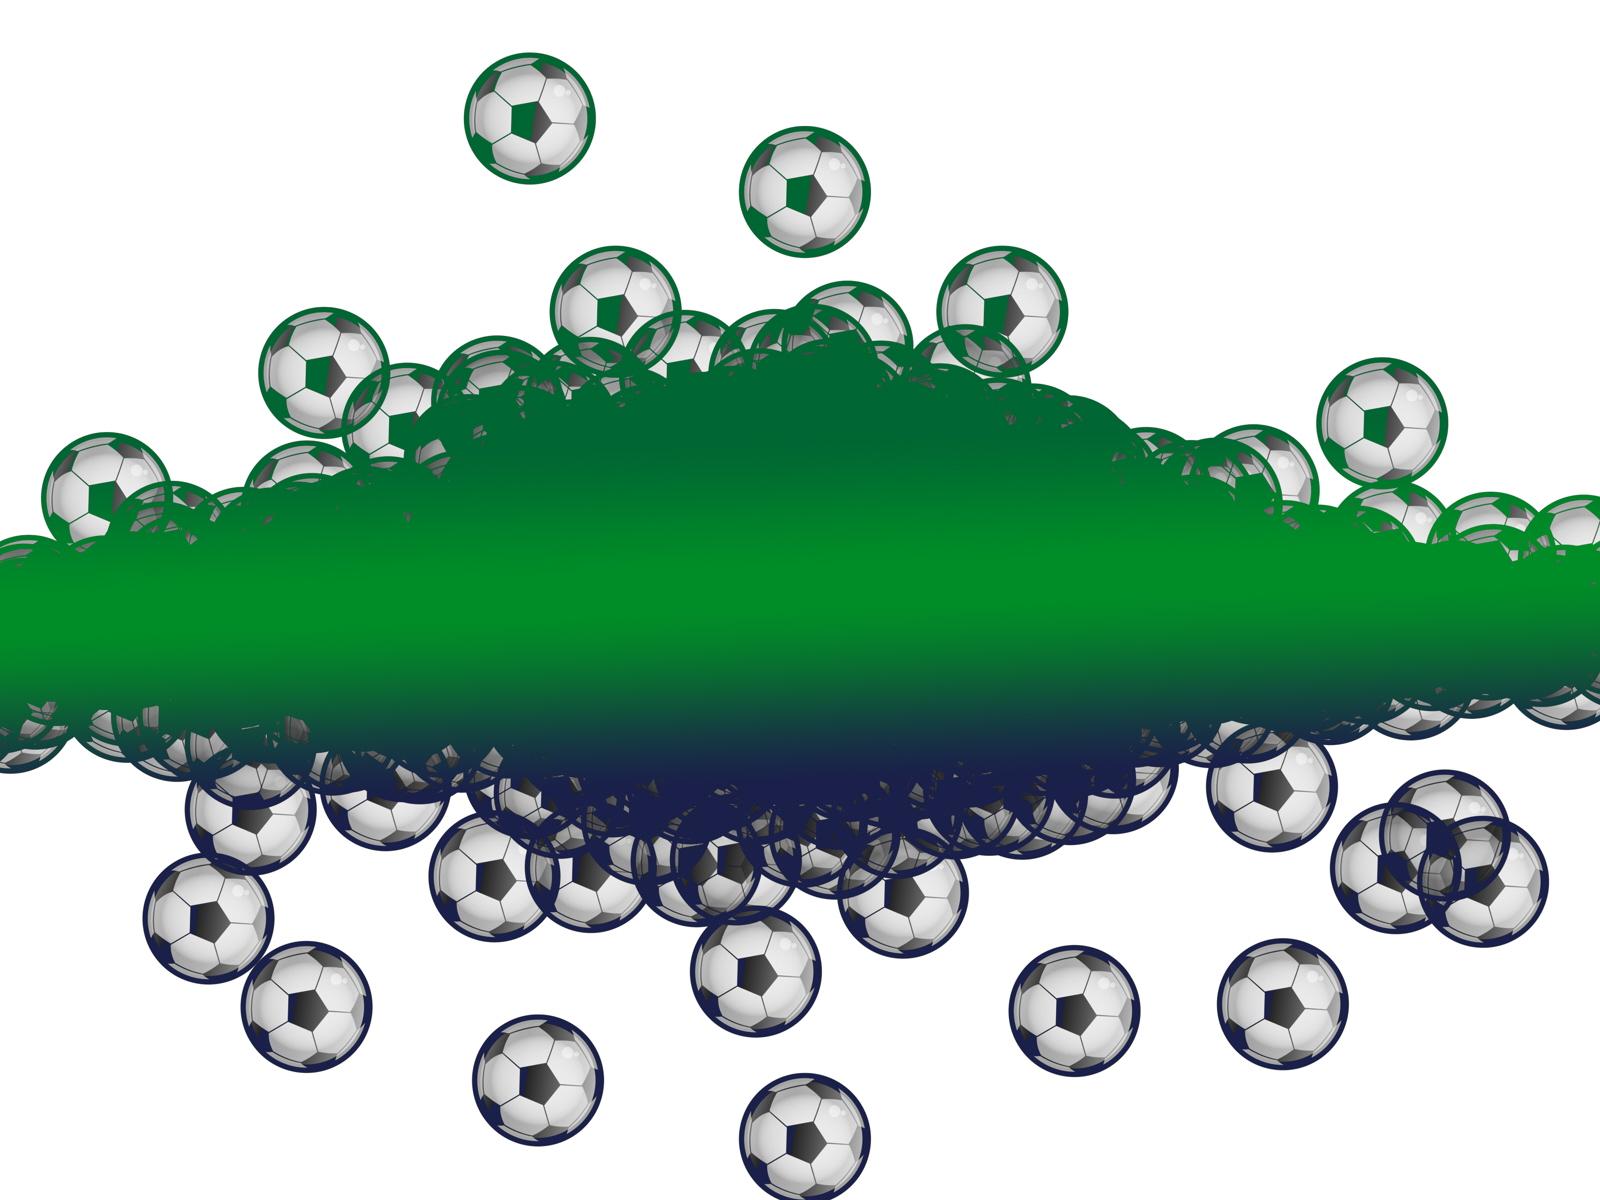 Grunge soccer photo